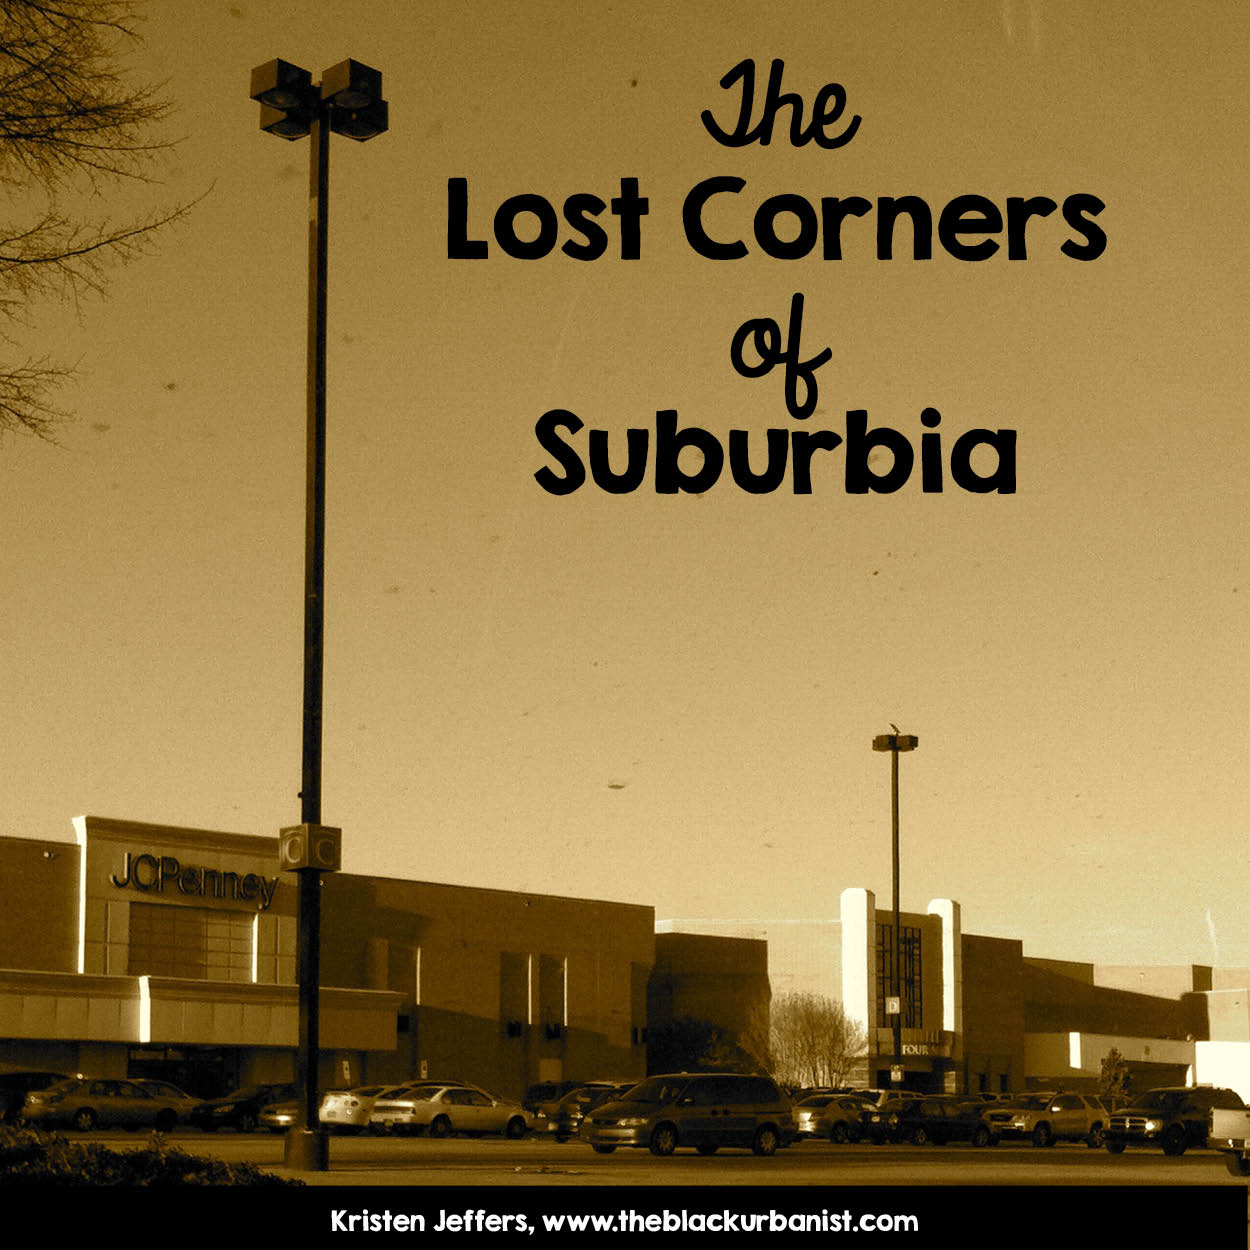 The Lost Corners of Suburbia